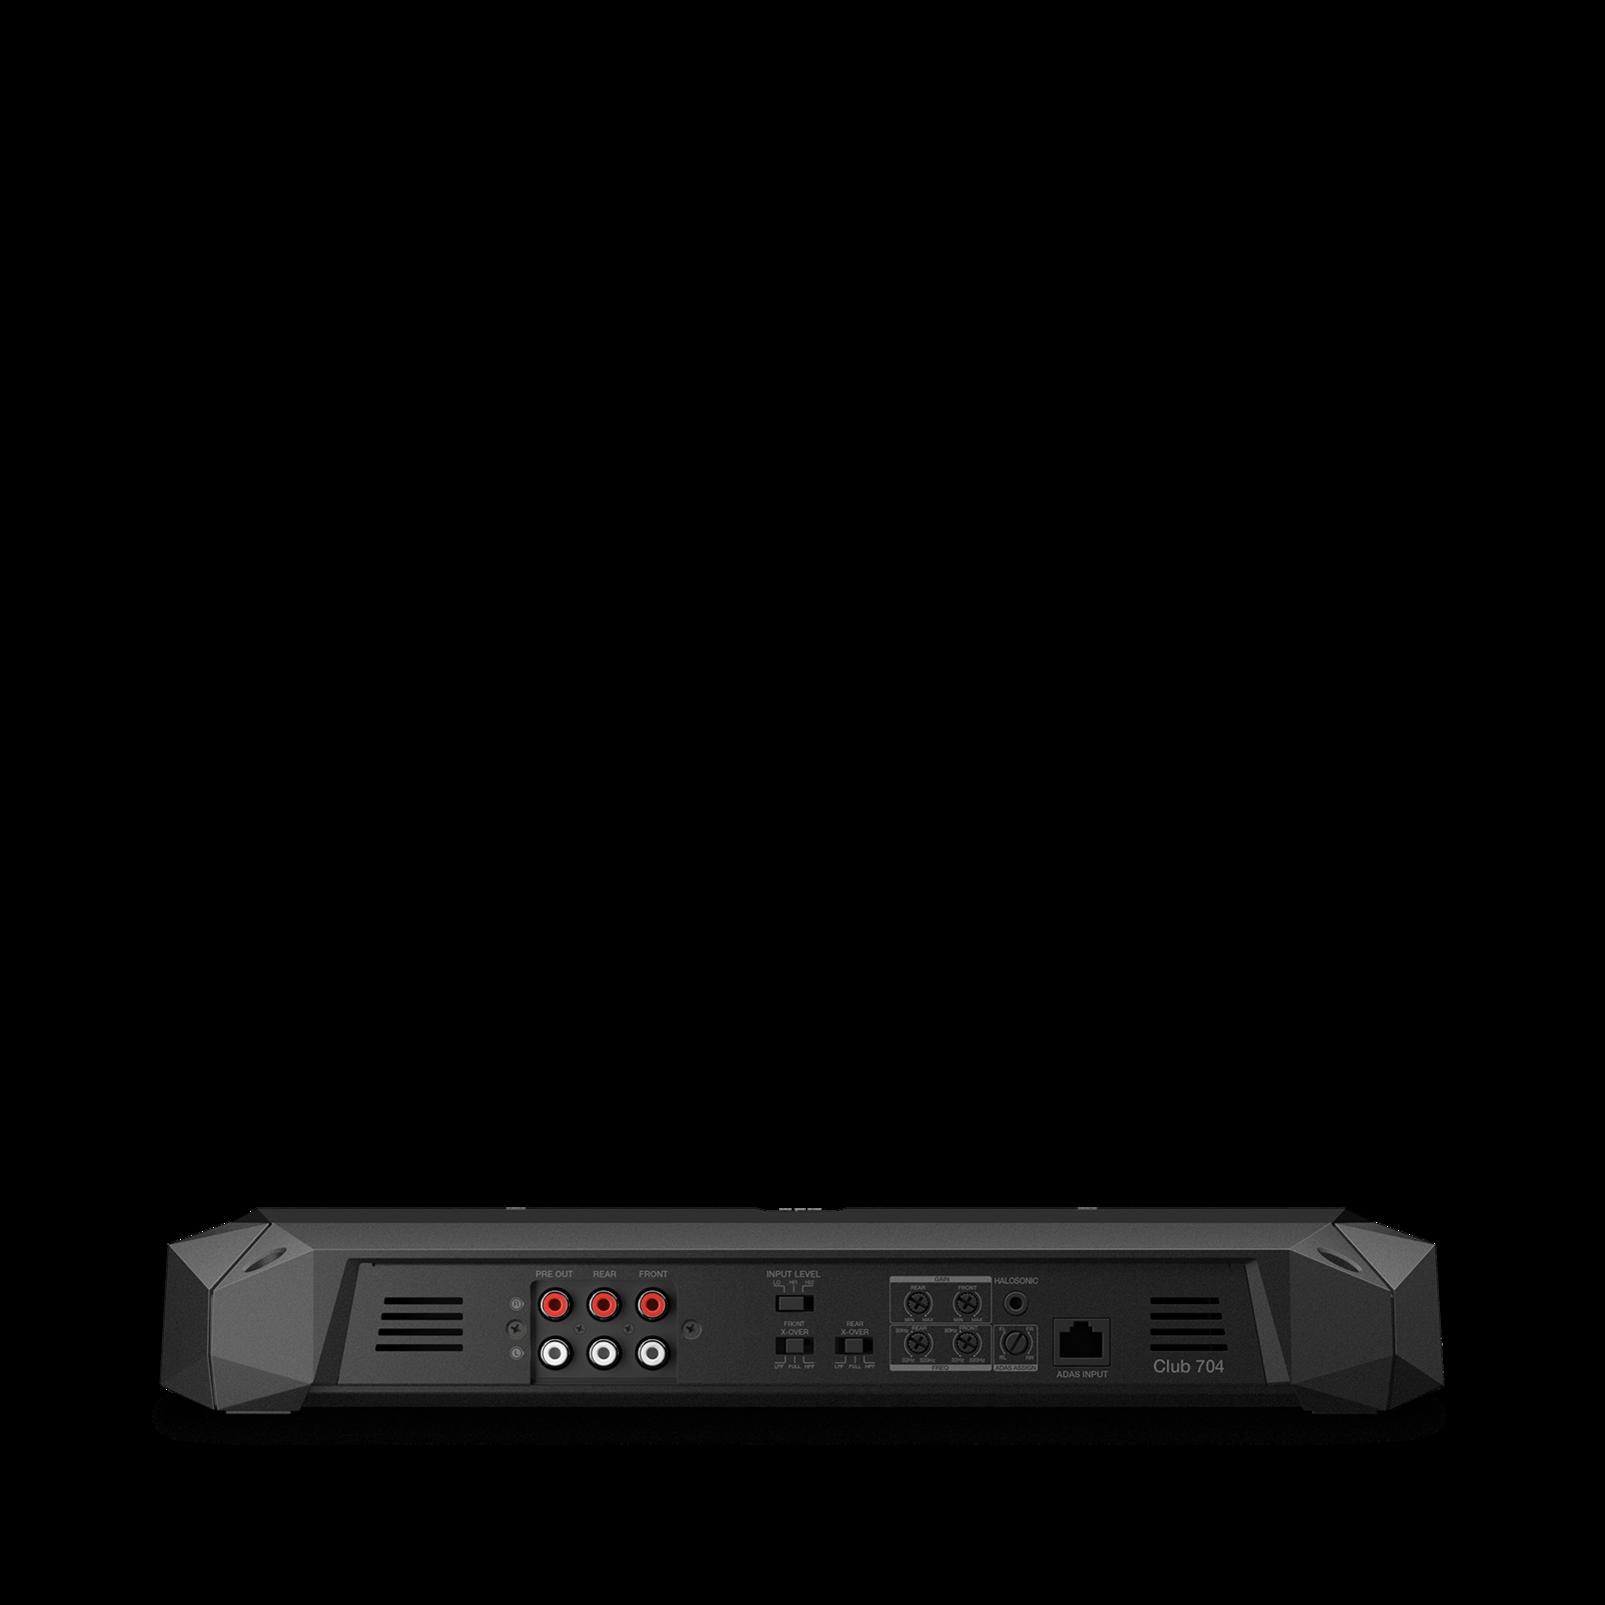 Club 704 - Black - high-performance 4-channel car amplifier - Back